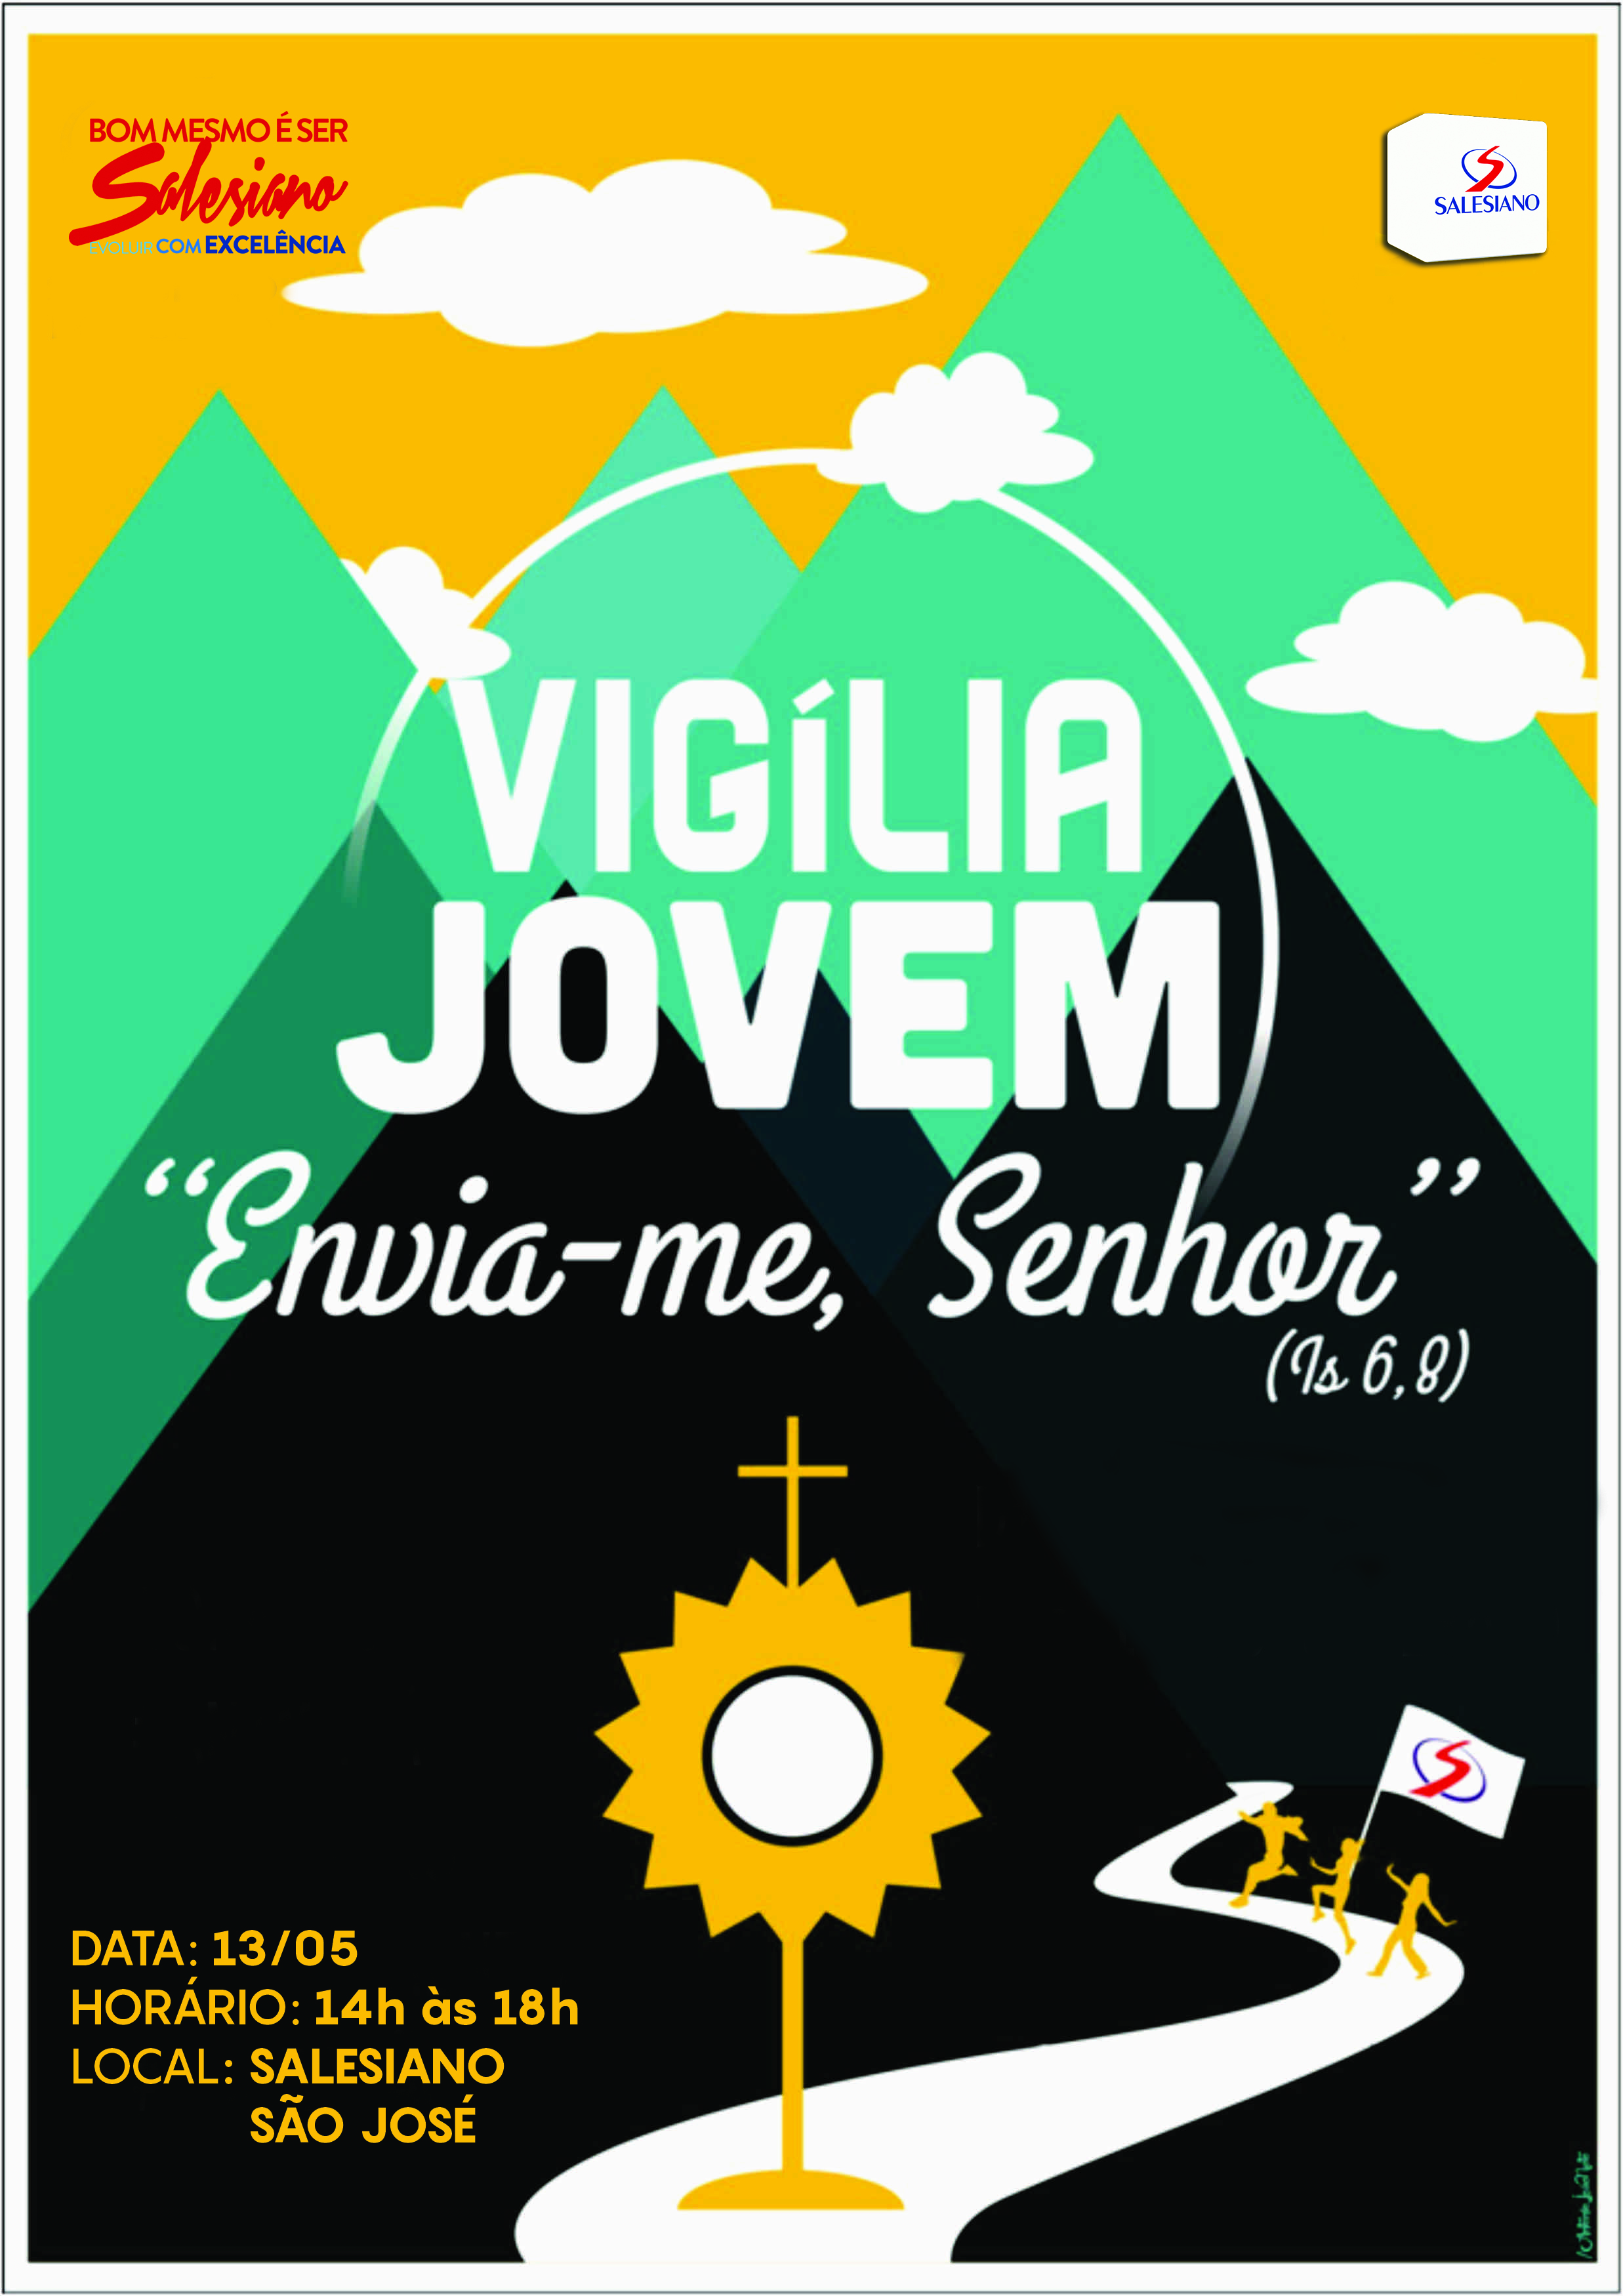 Cartaz_da_vigi_lia_jovem__1_